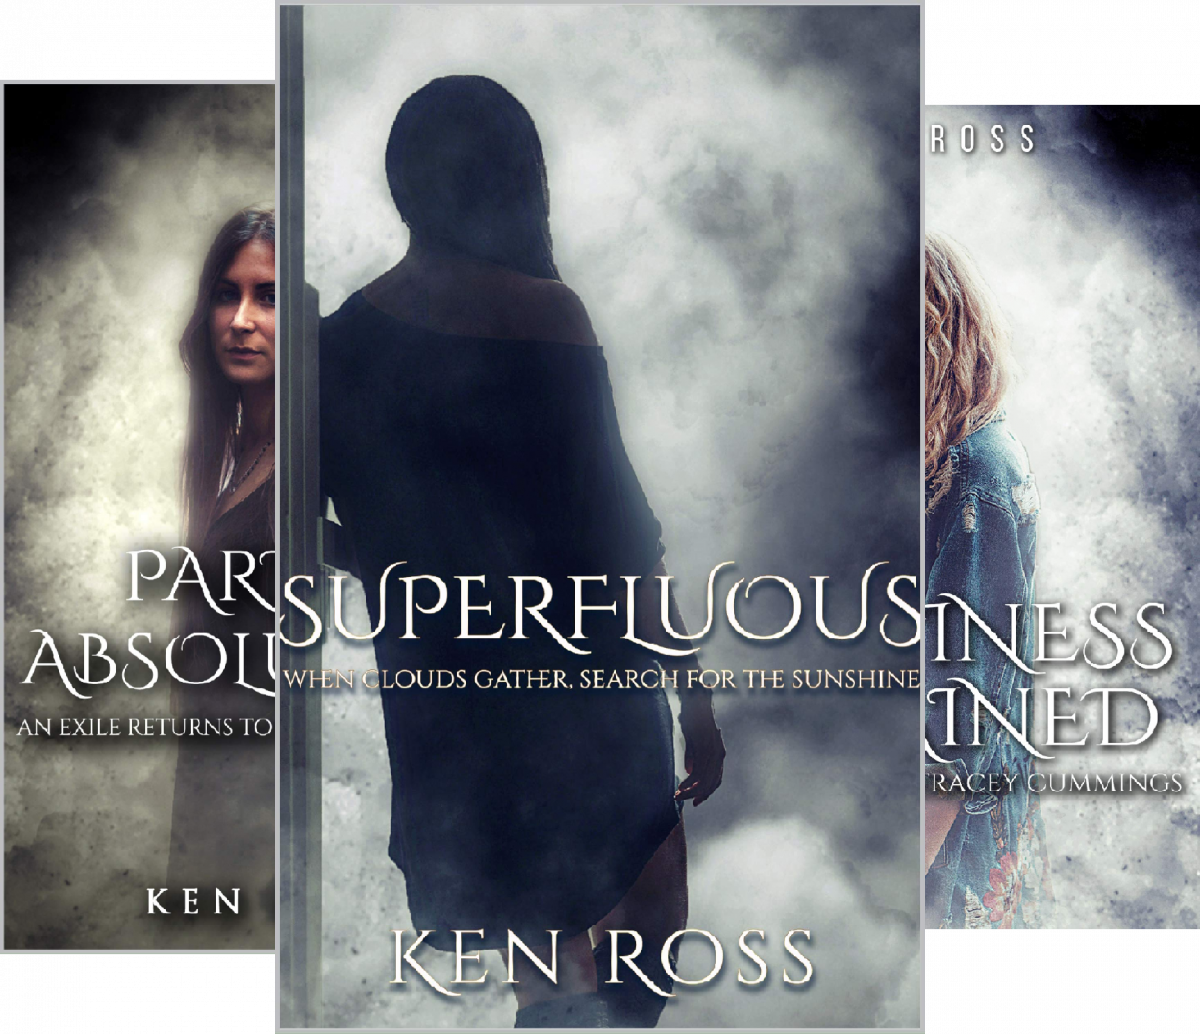 FREE: ROSA'S CONFESSIONS (Erotic Romance Series)